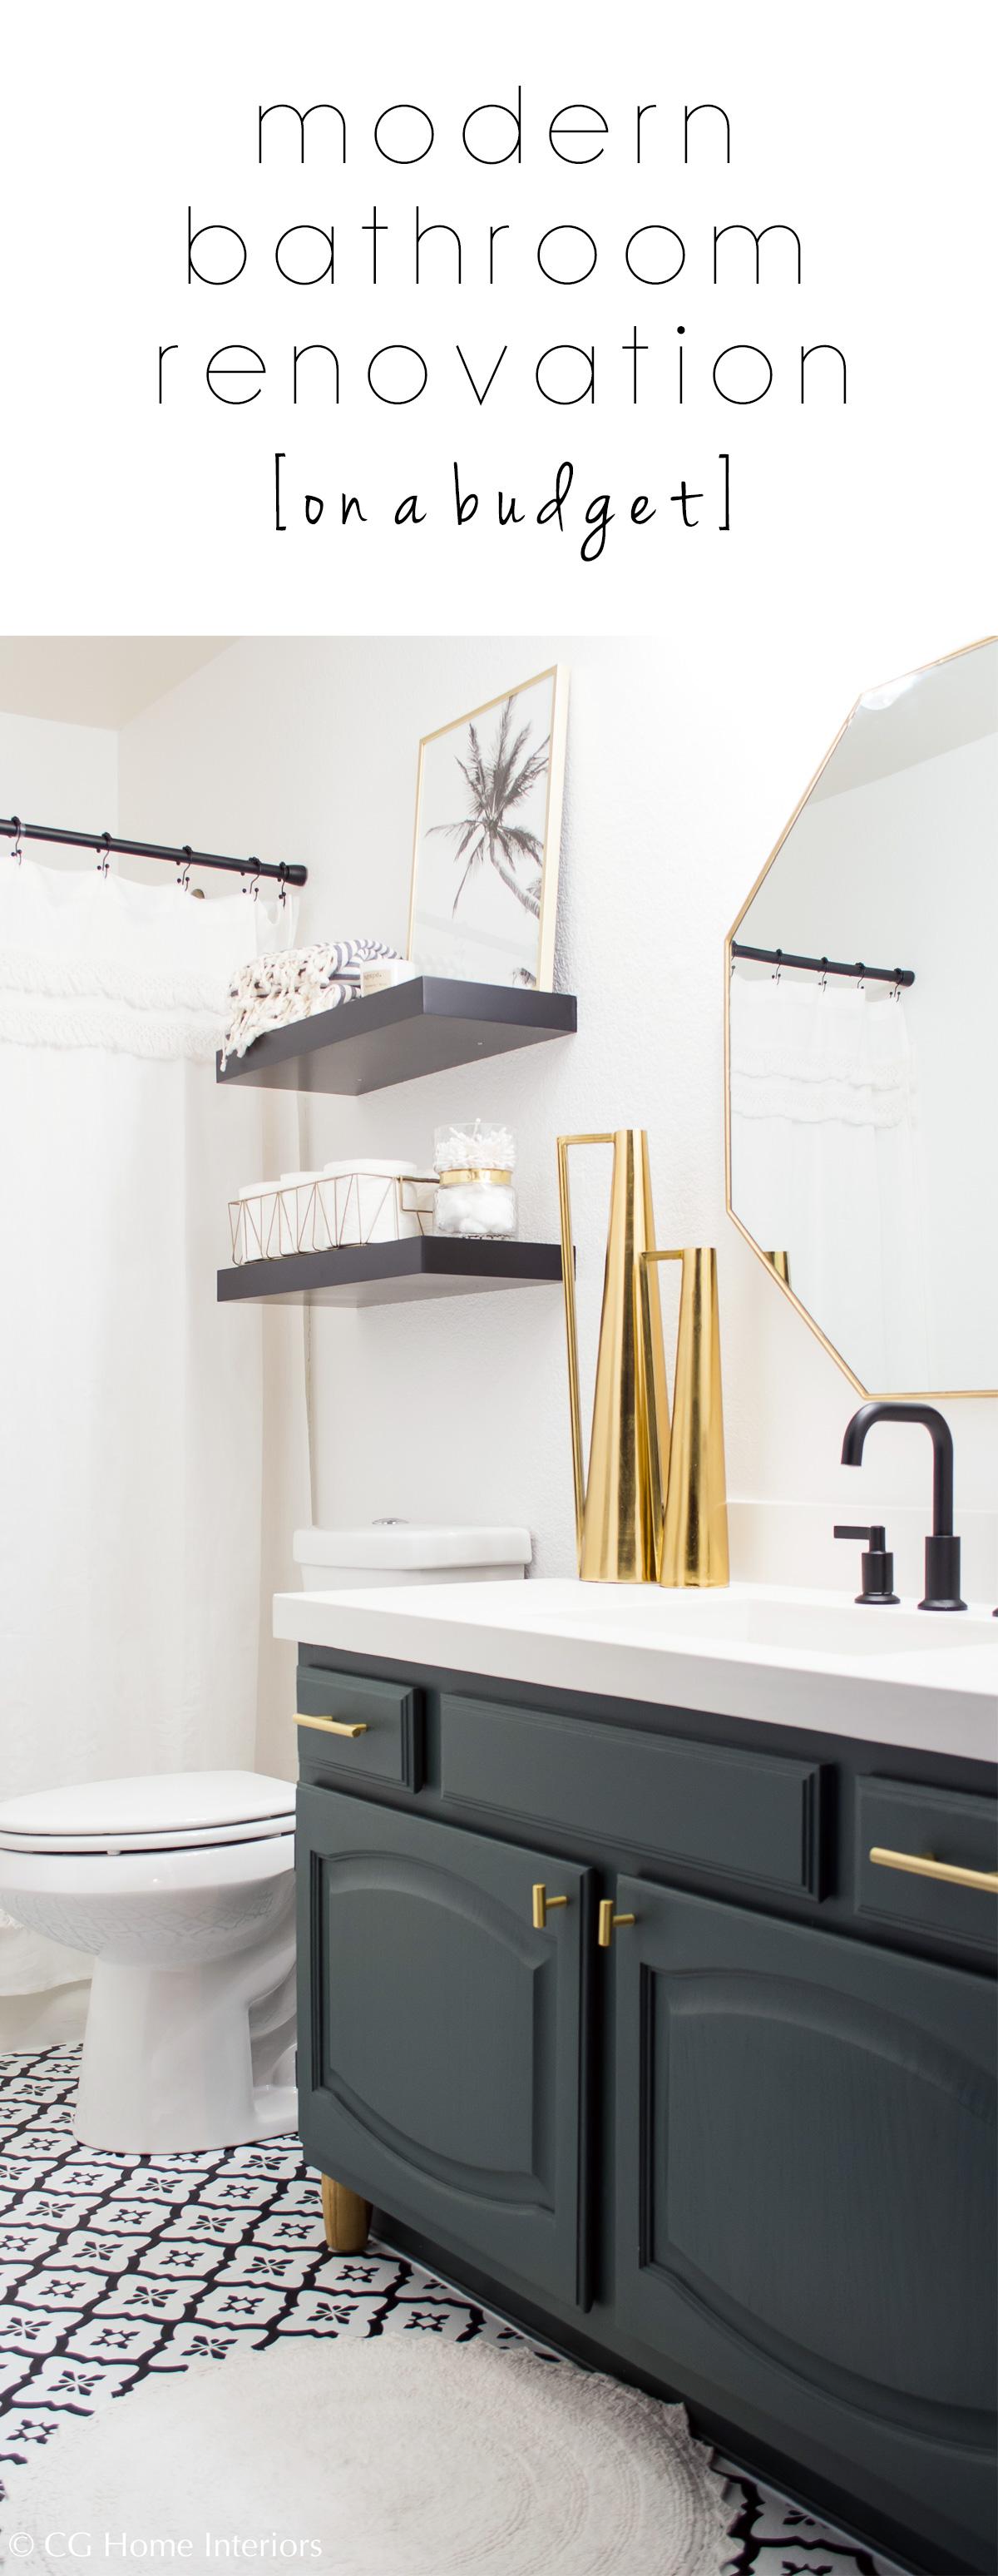 Pinterest Modern Guest Bathroom Renovation on a Budget – One Room Challenge REVEAL